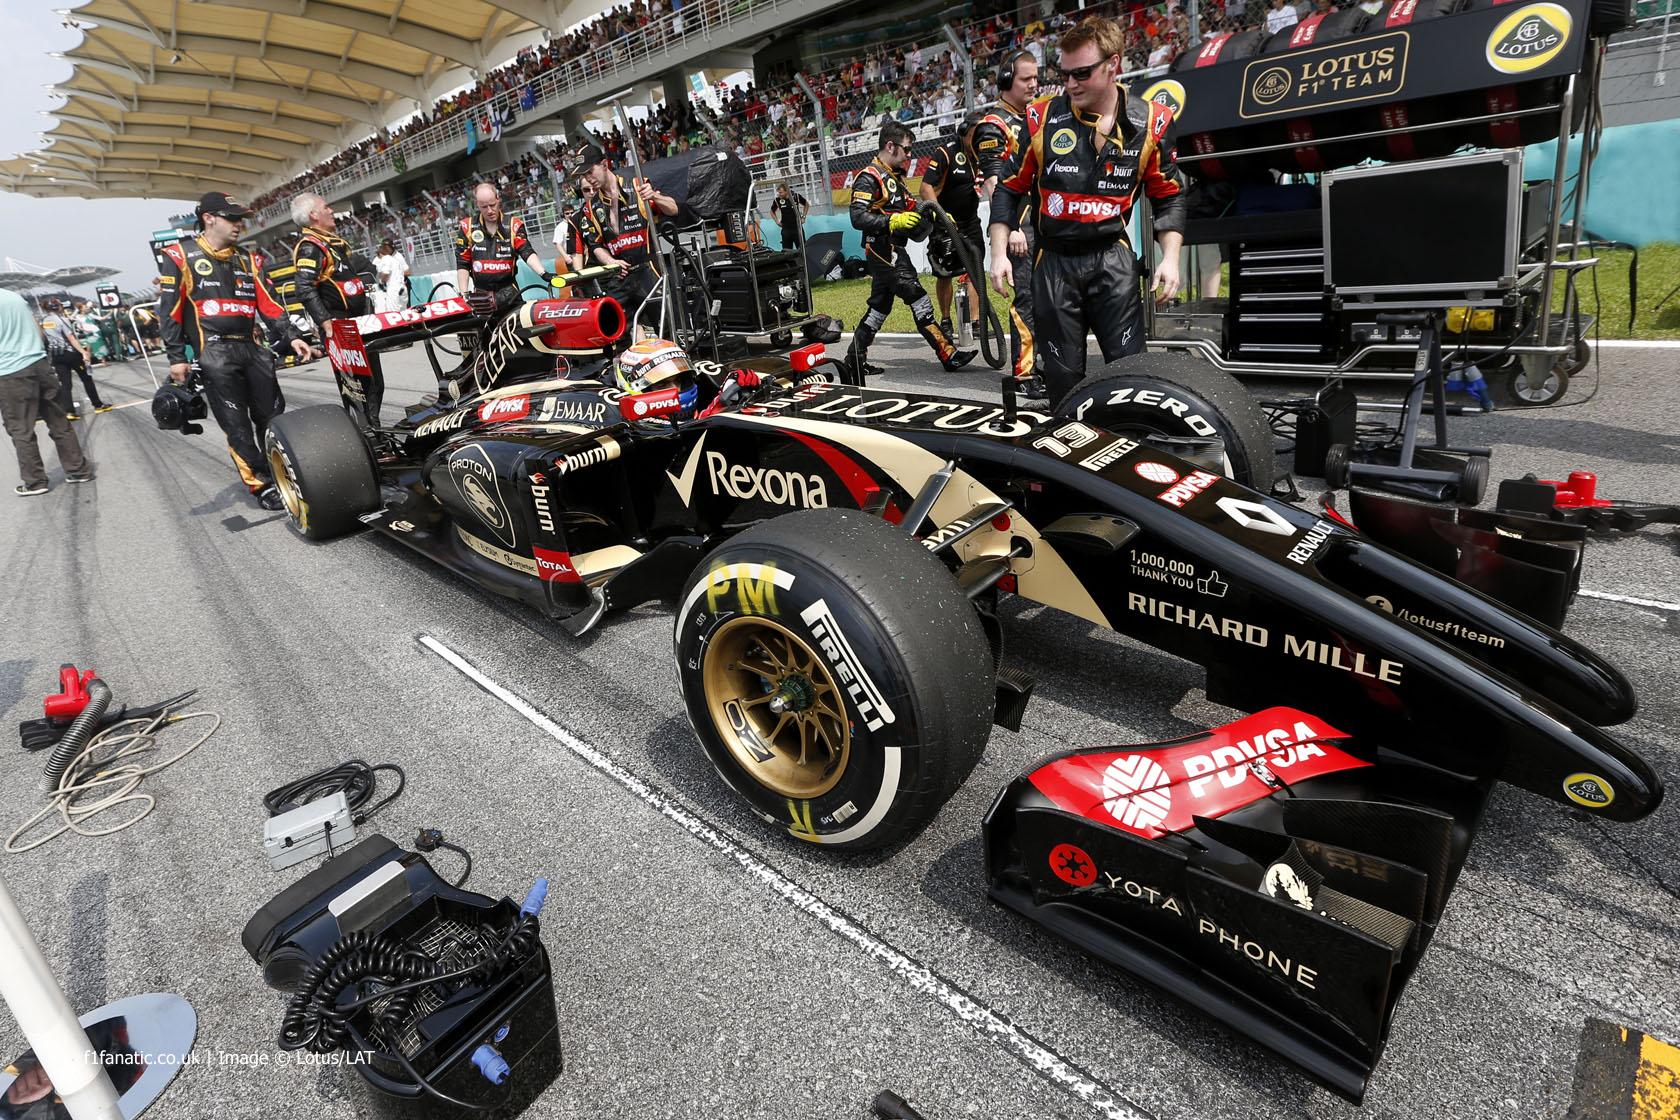 Pastor Maldonado, Lotus, Sepang International Circuit, 2014